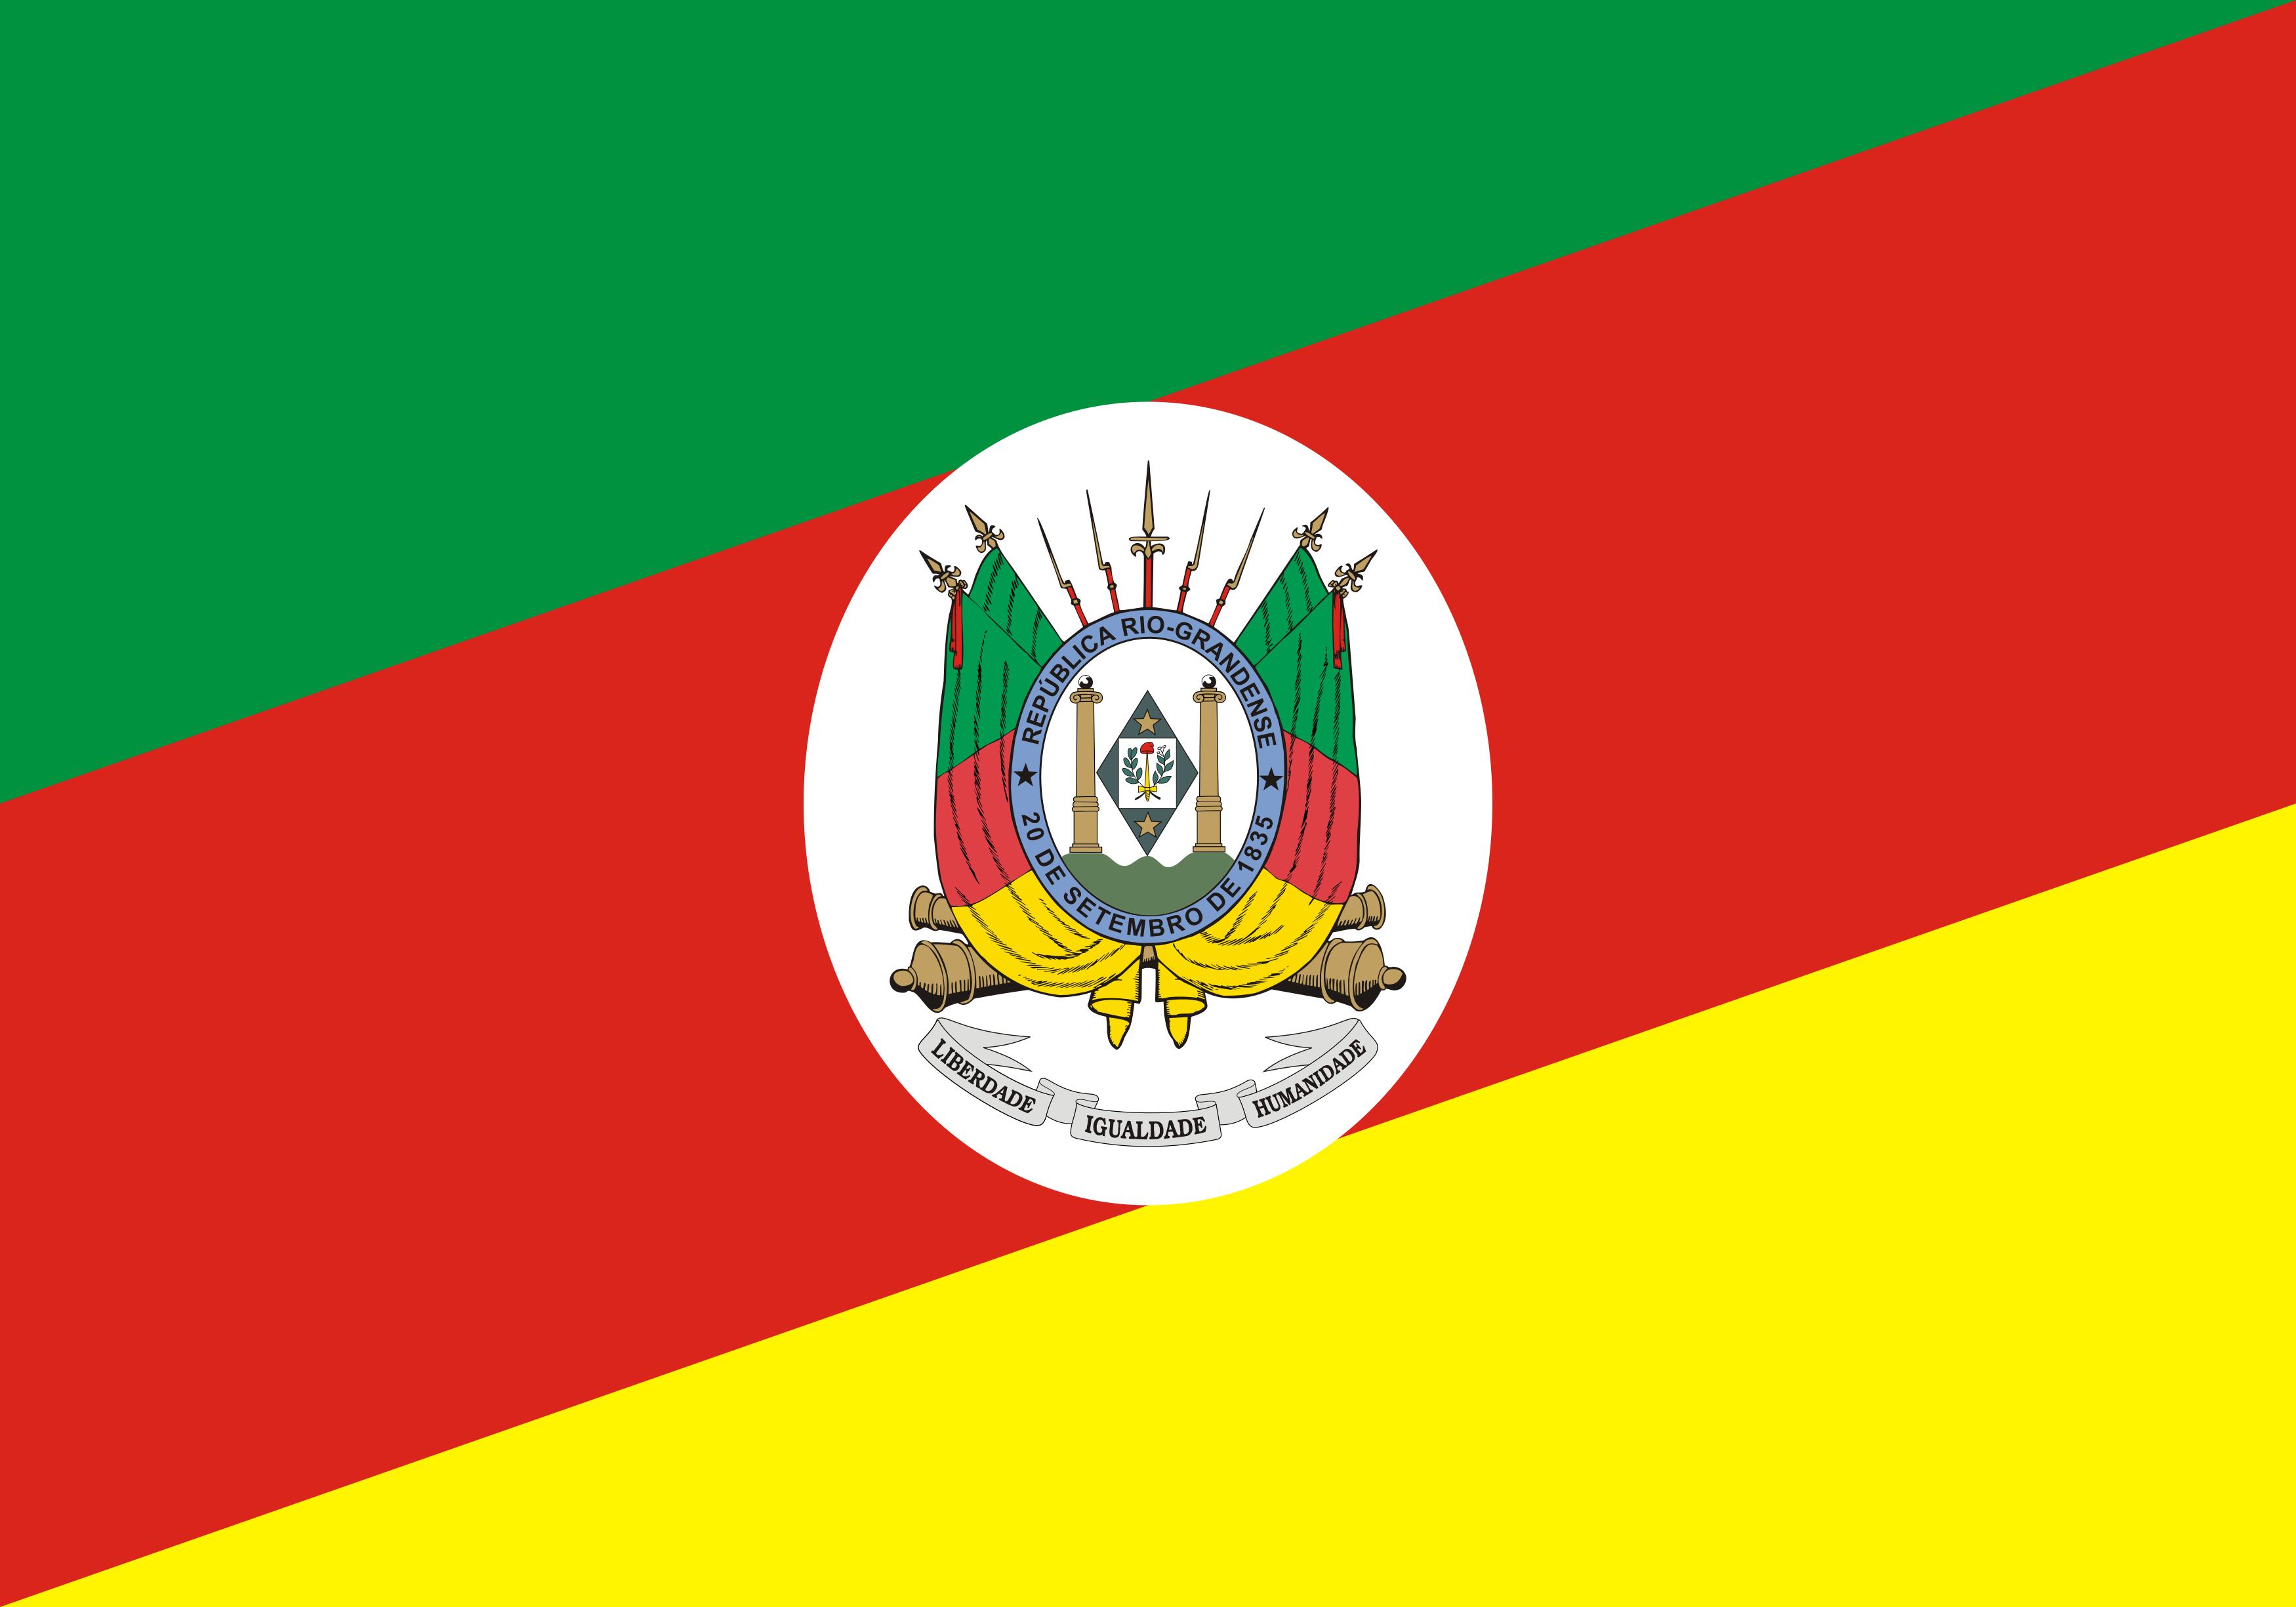 bandeira-do-estado-do-rio-grande-do-sul